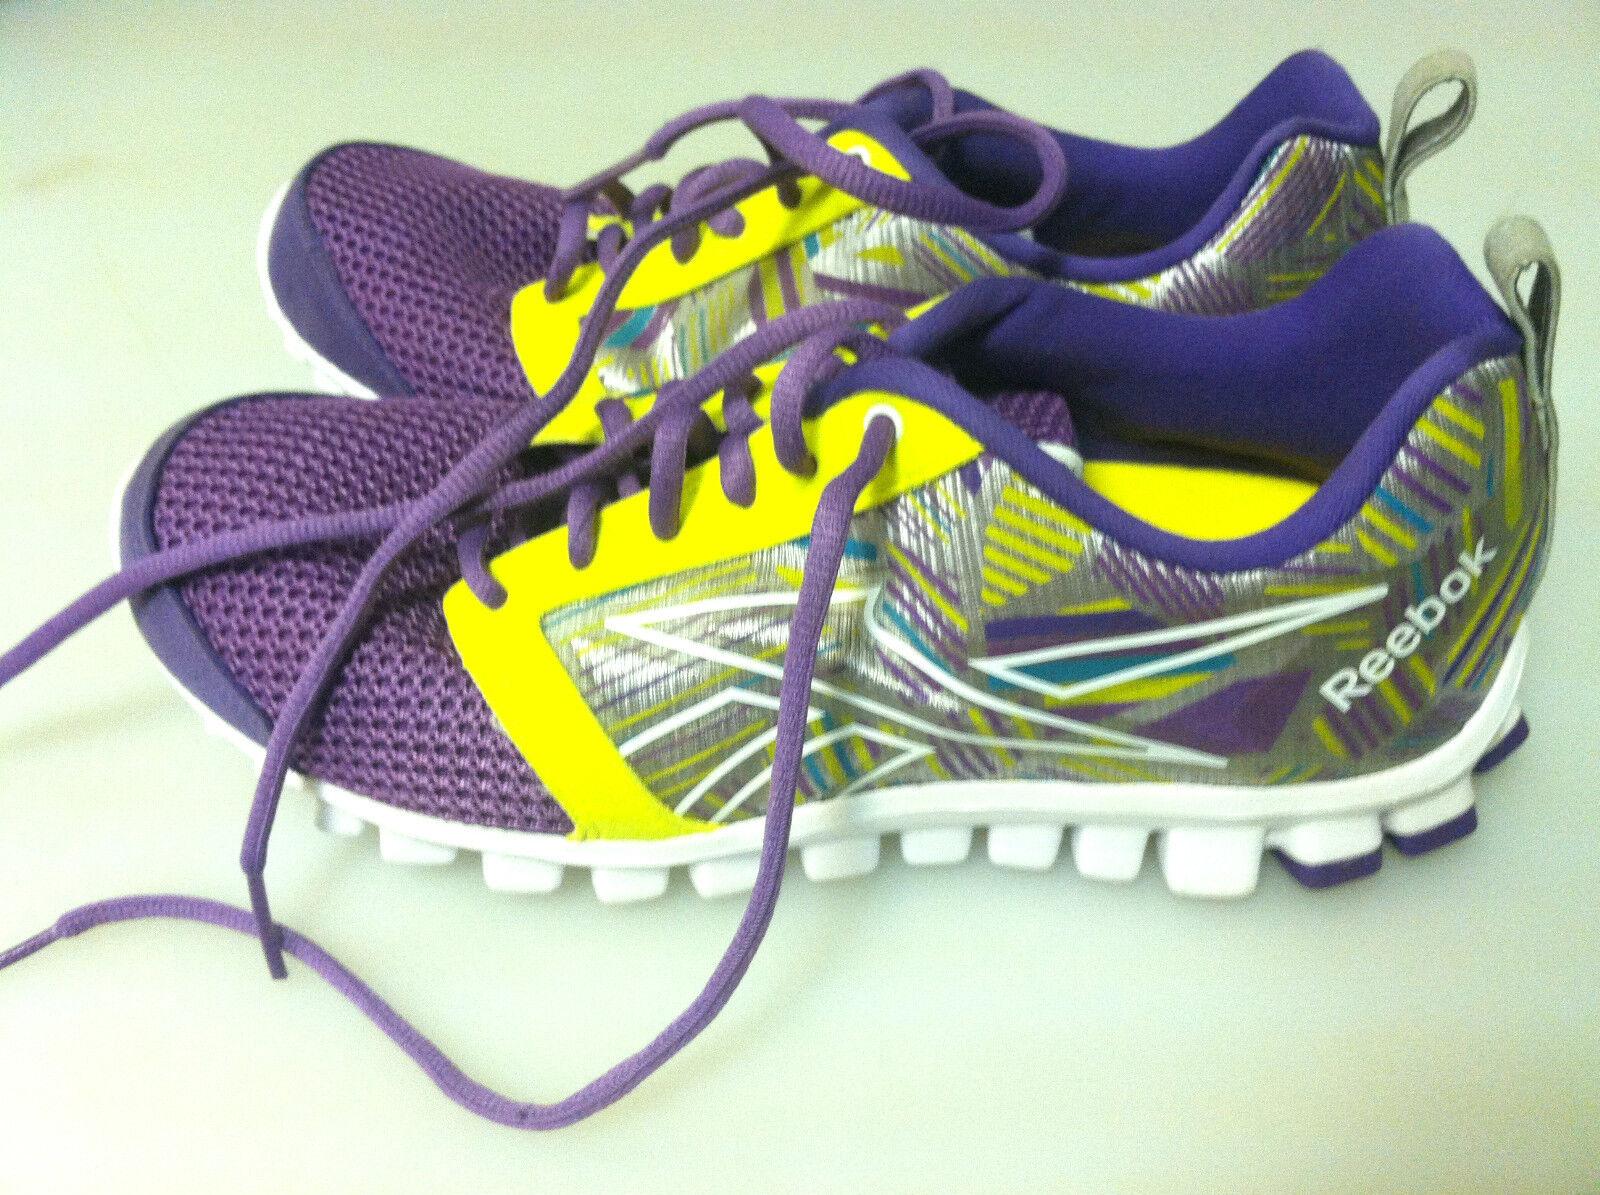 Reebok SZ 7 Mujer Running Zapatillas - 3d Ultralite - Multicolor - NWOB sho-10